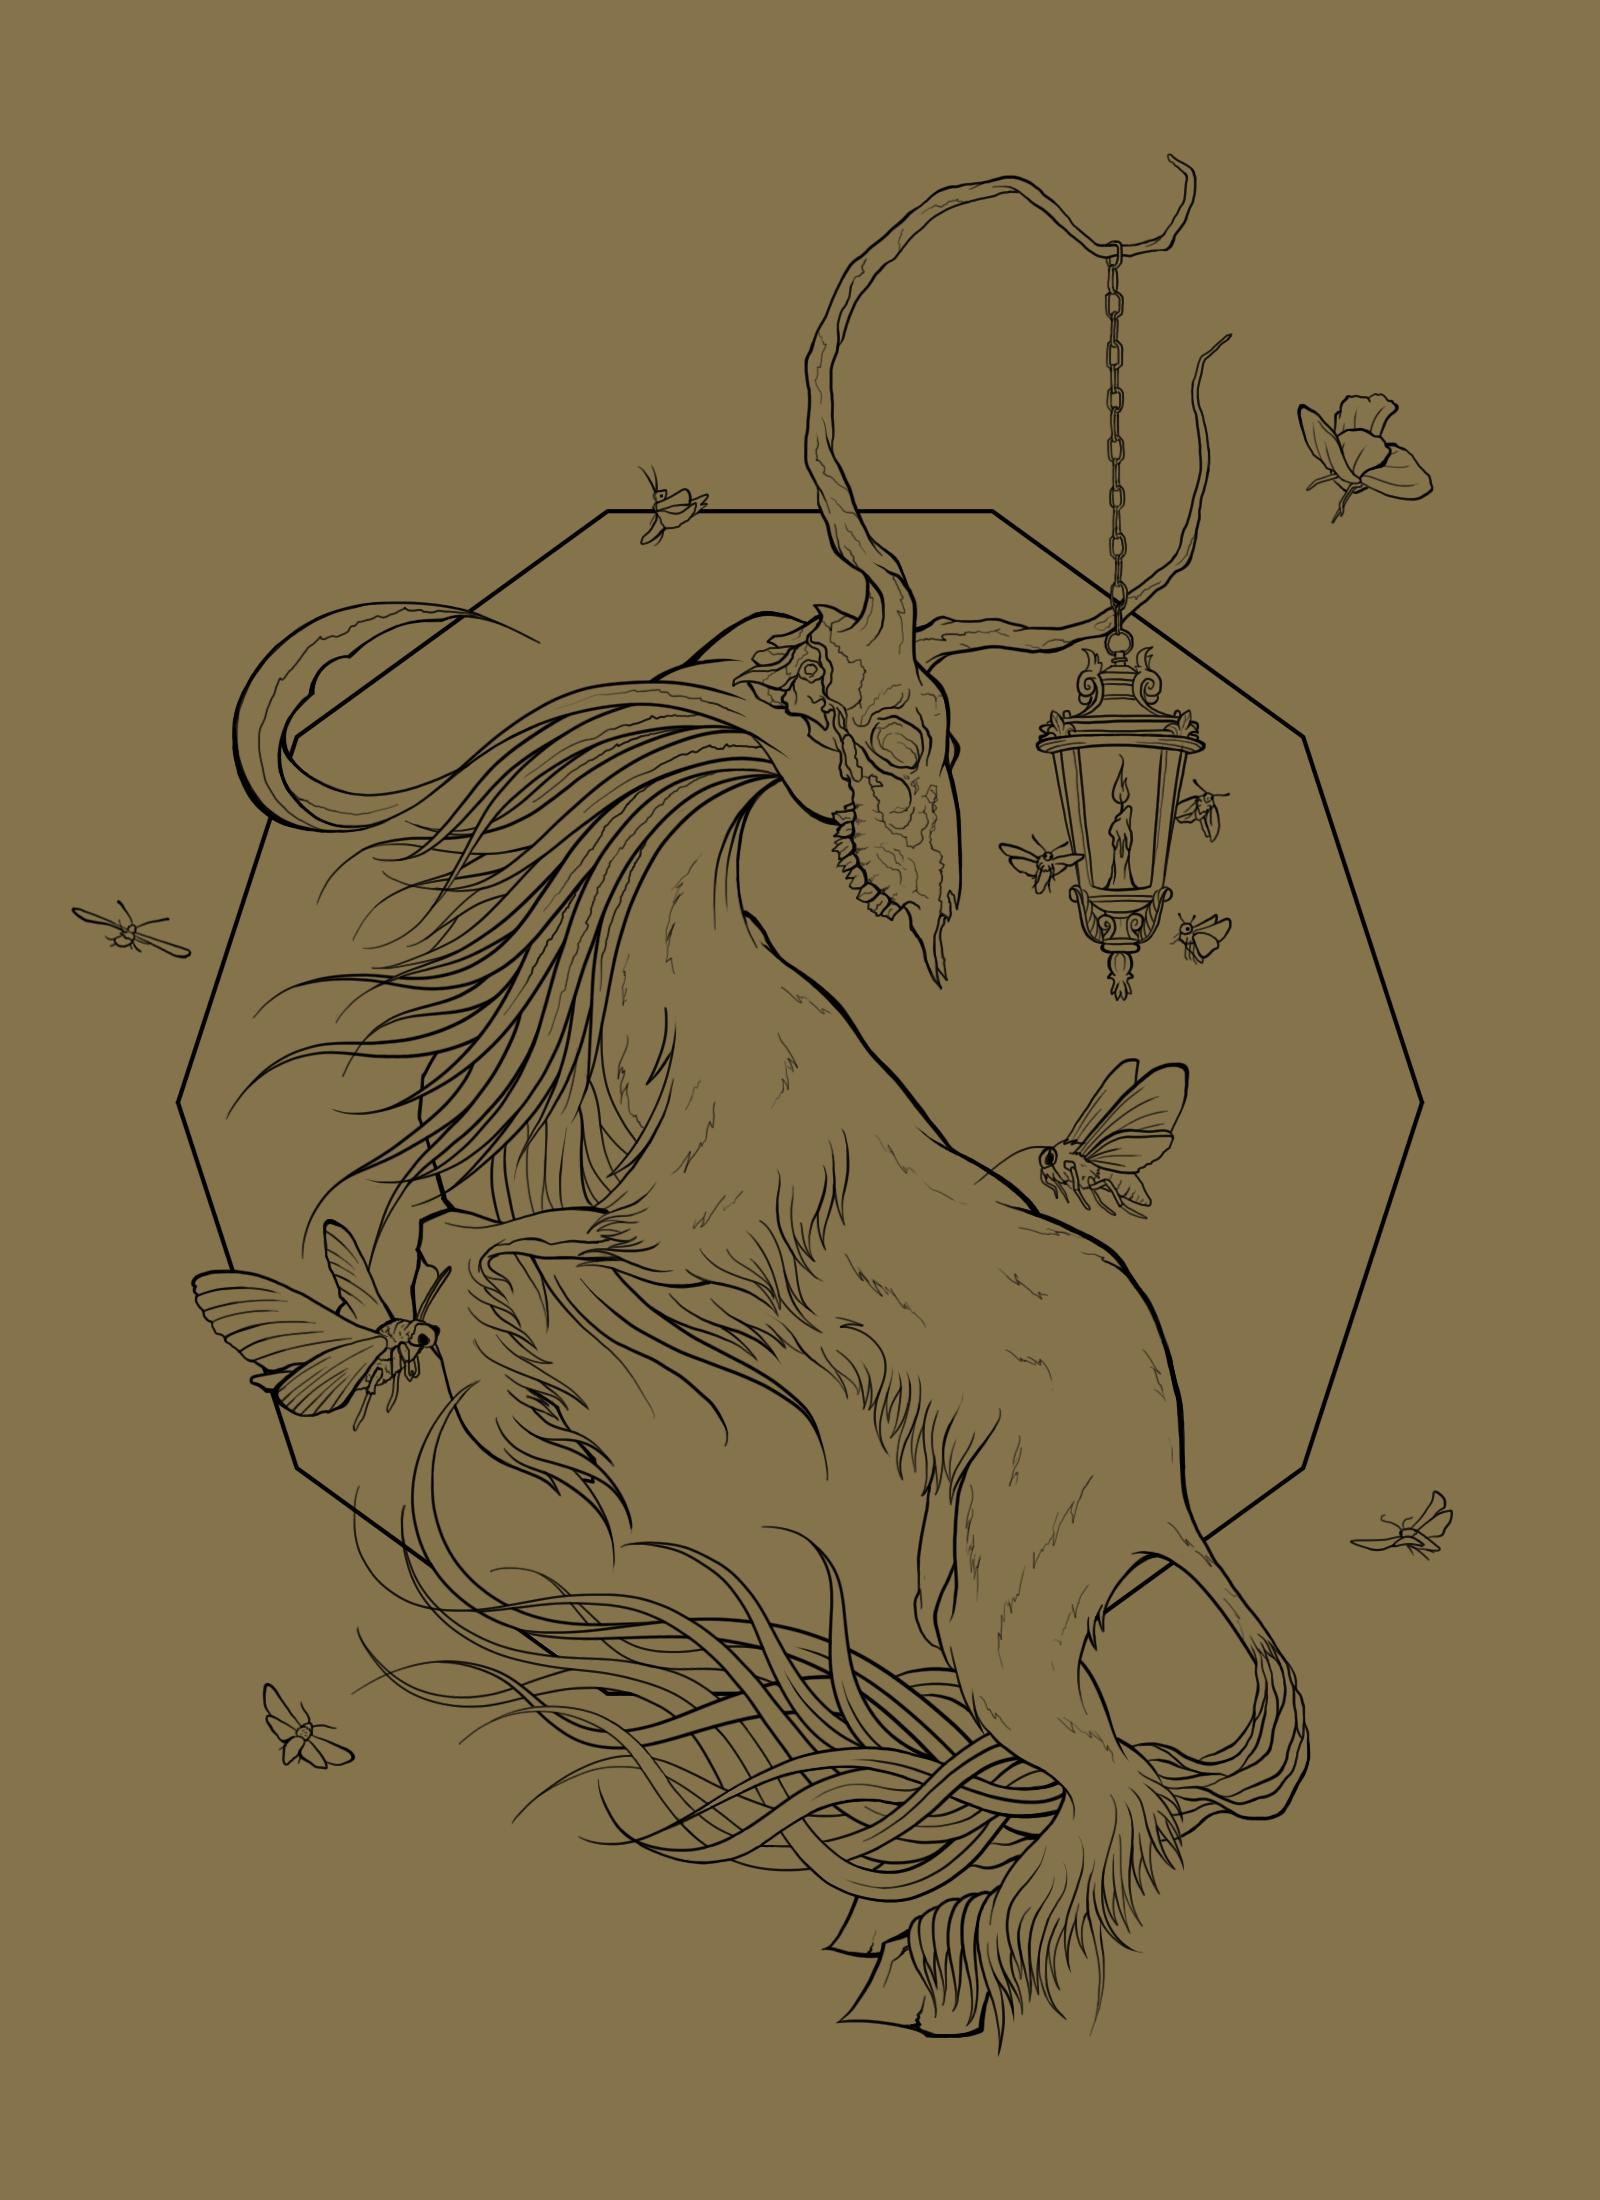 """Gatekeeper"" poster, colour design 1.  #Gatekeeper #Illustration #Art #Poster #Animal #Deer #Moth #Mystical #Fantasy"